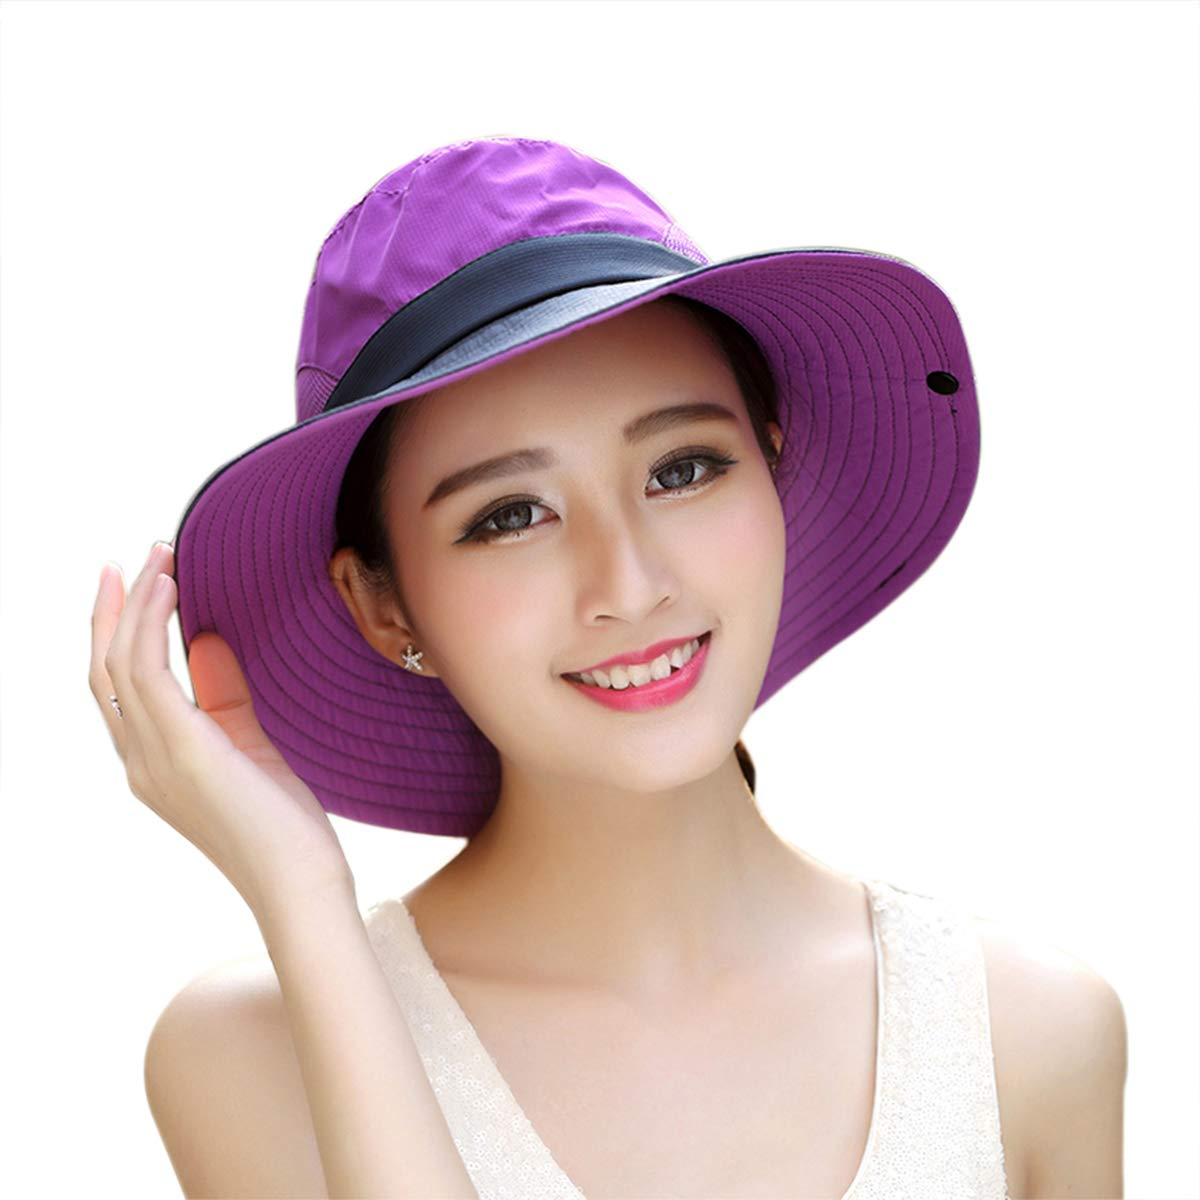 Sun Hat Wide Brim UV Protection Breathable Outdoor Boonie Hats Adjustable Beach Cap Purple 18